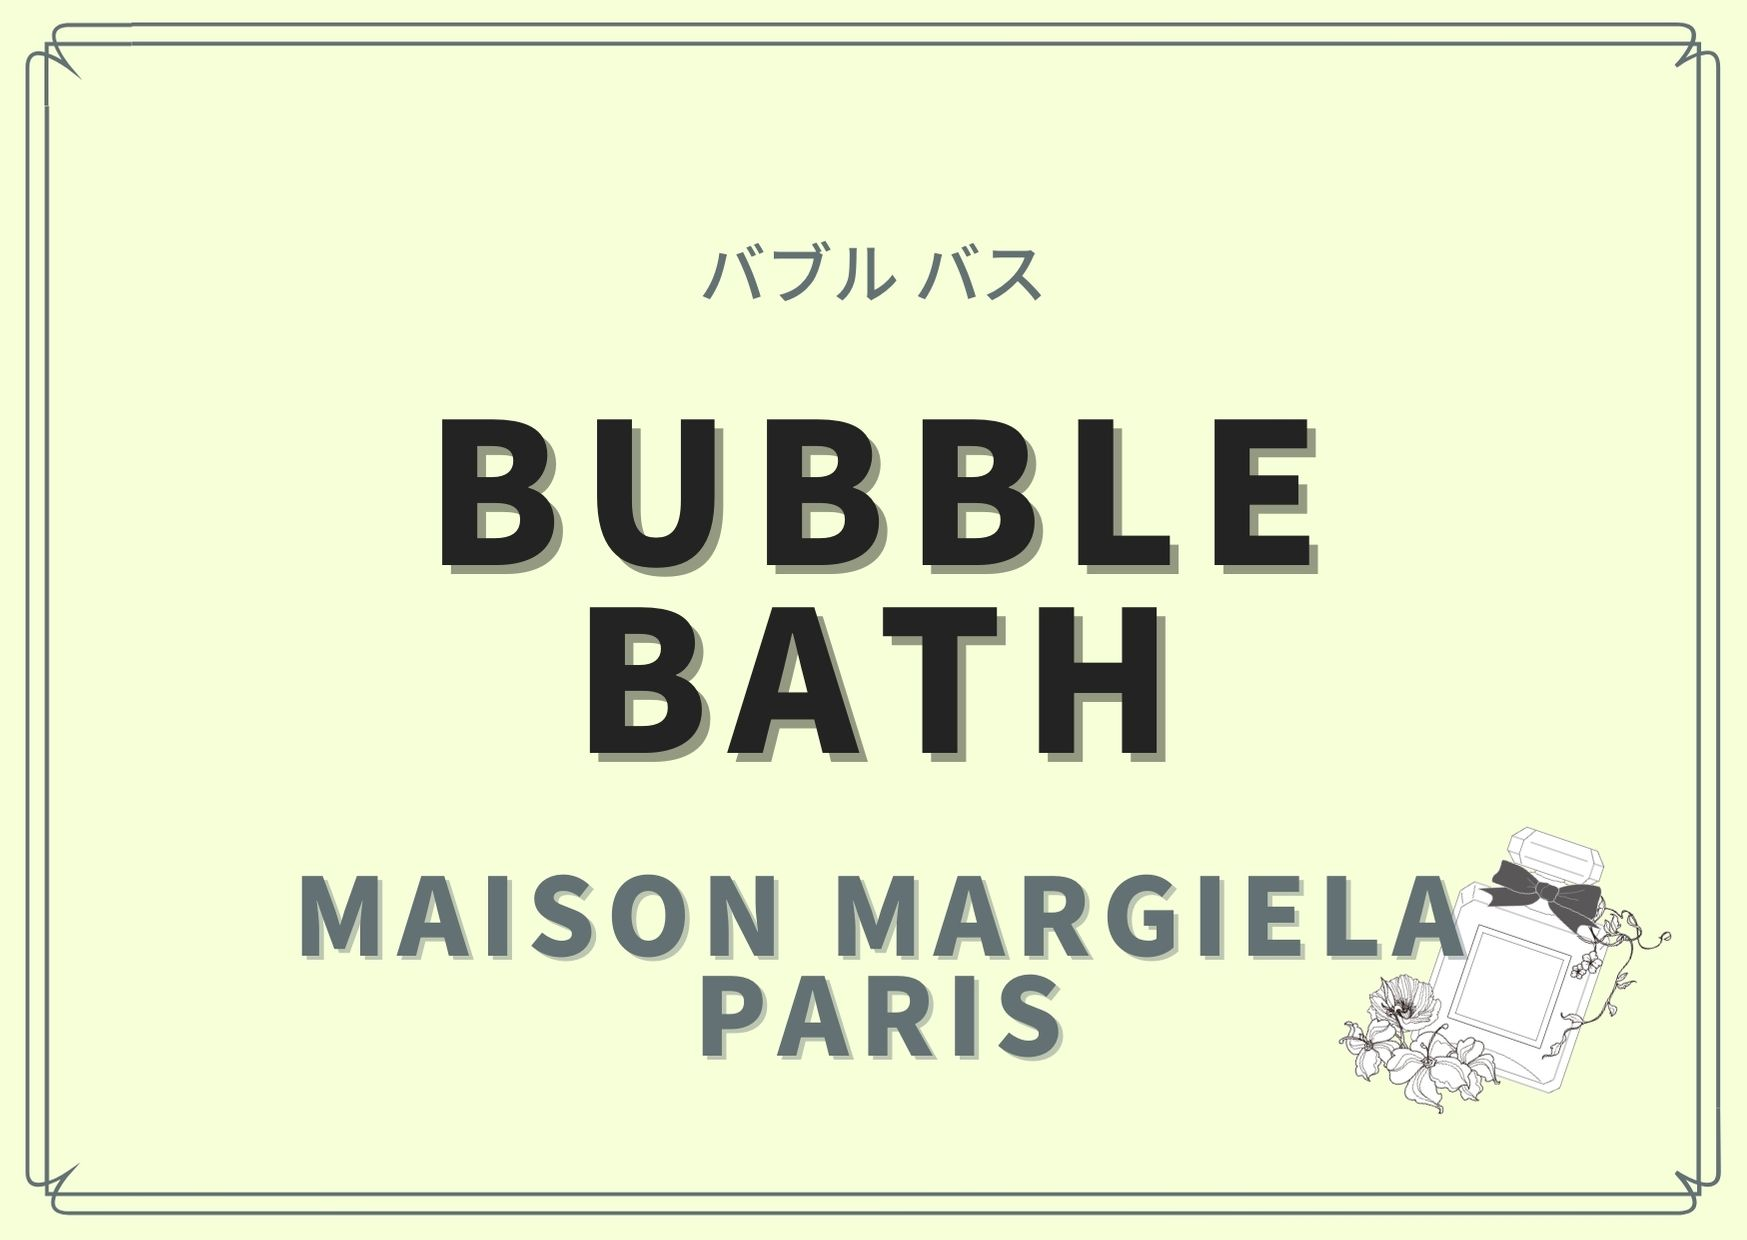 Bubble Bath(バブル バス)/ Maison Margiela paris(メゾン マルジェラ)